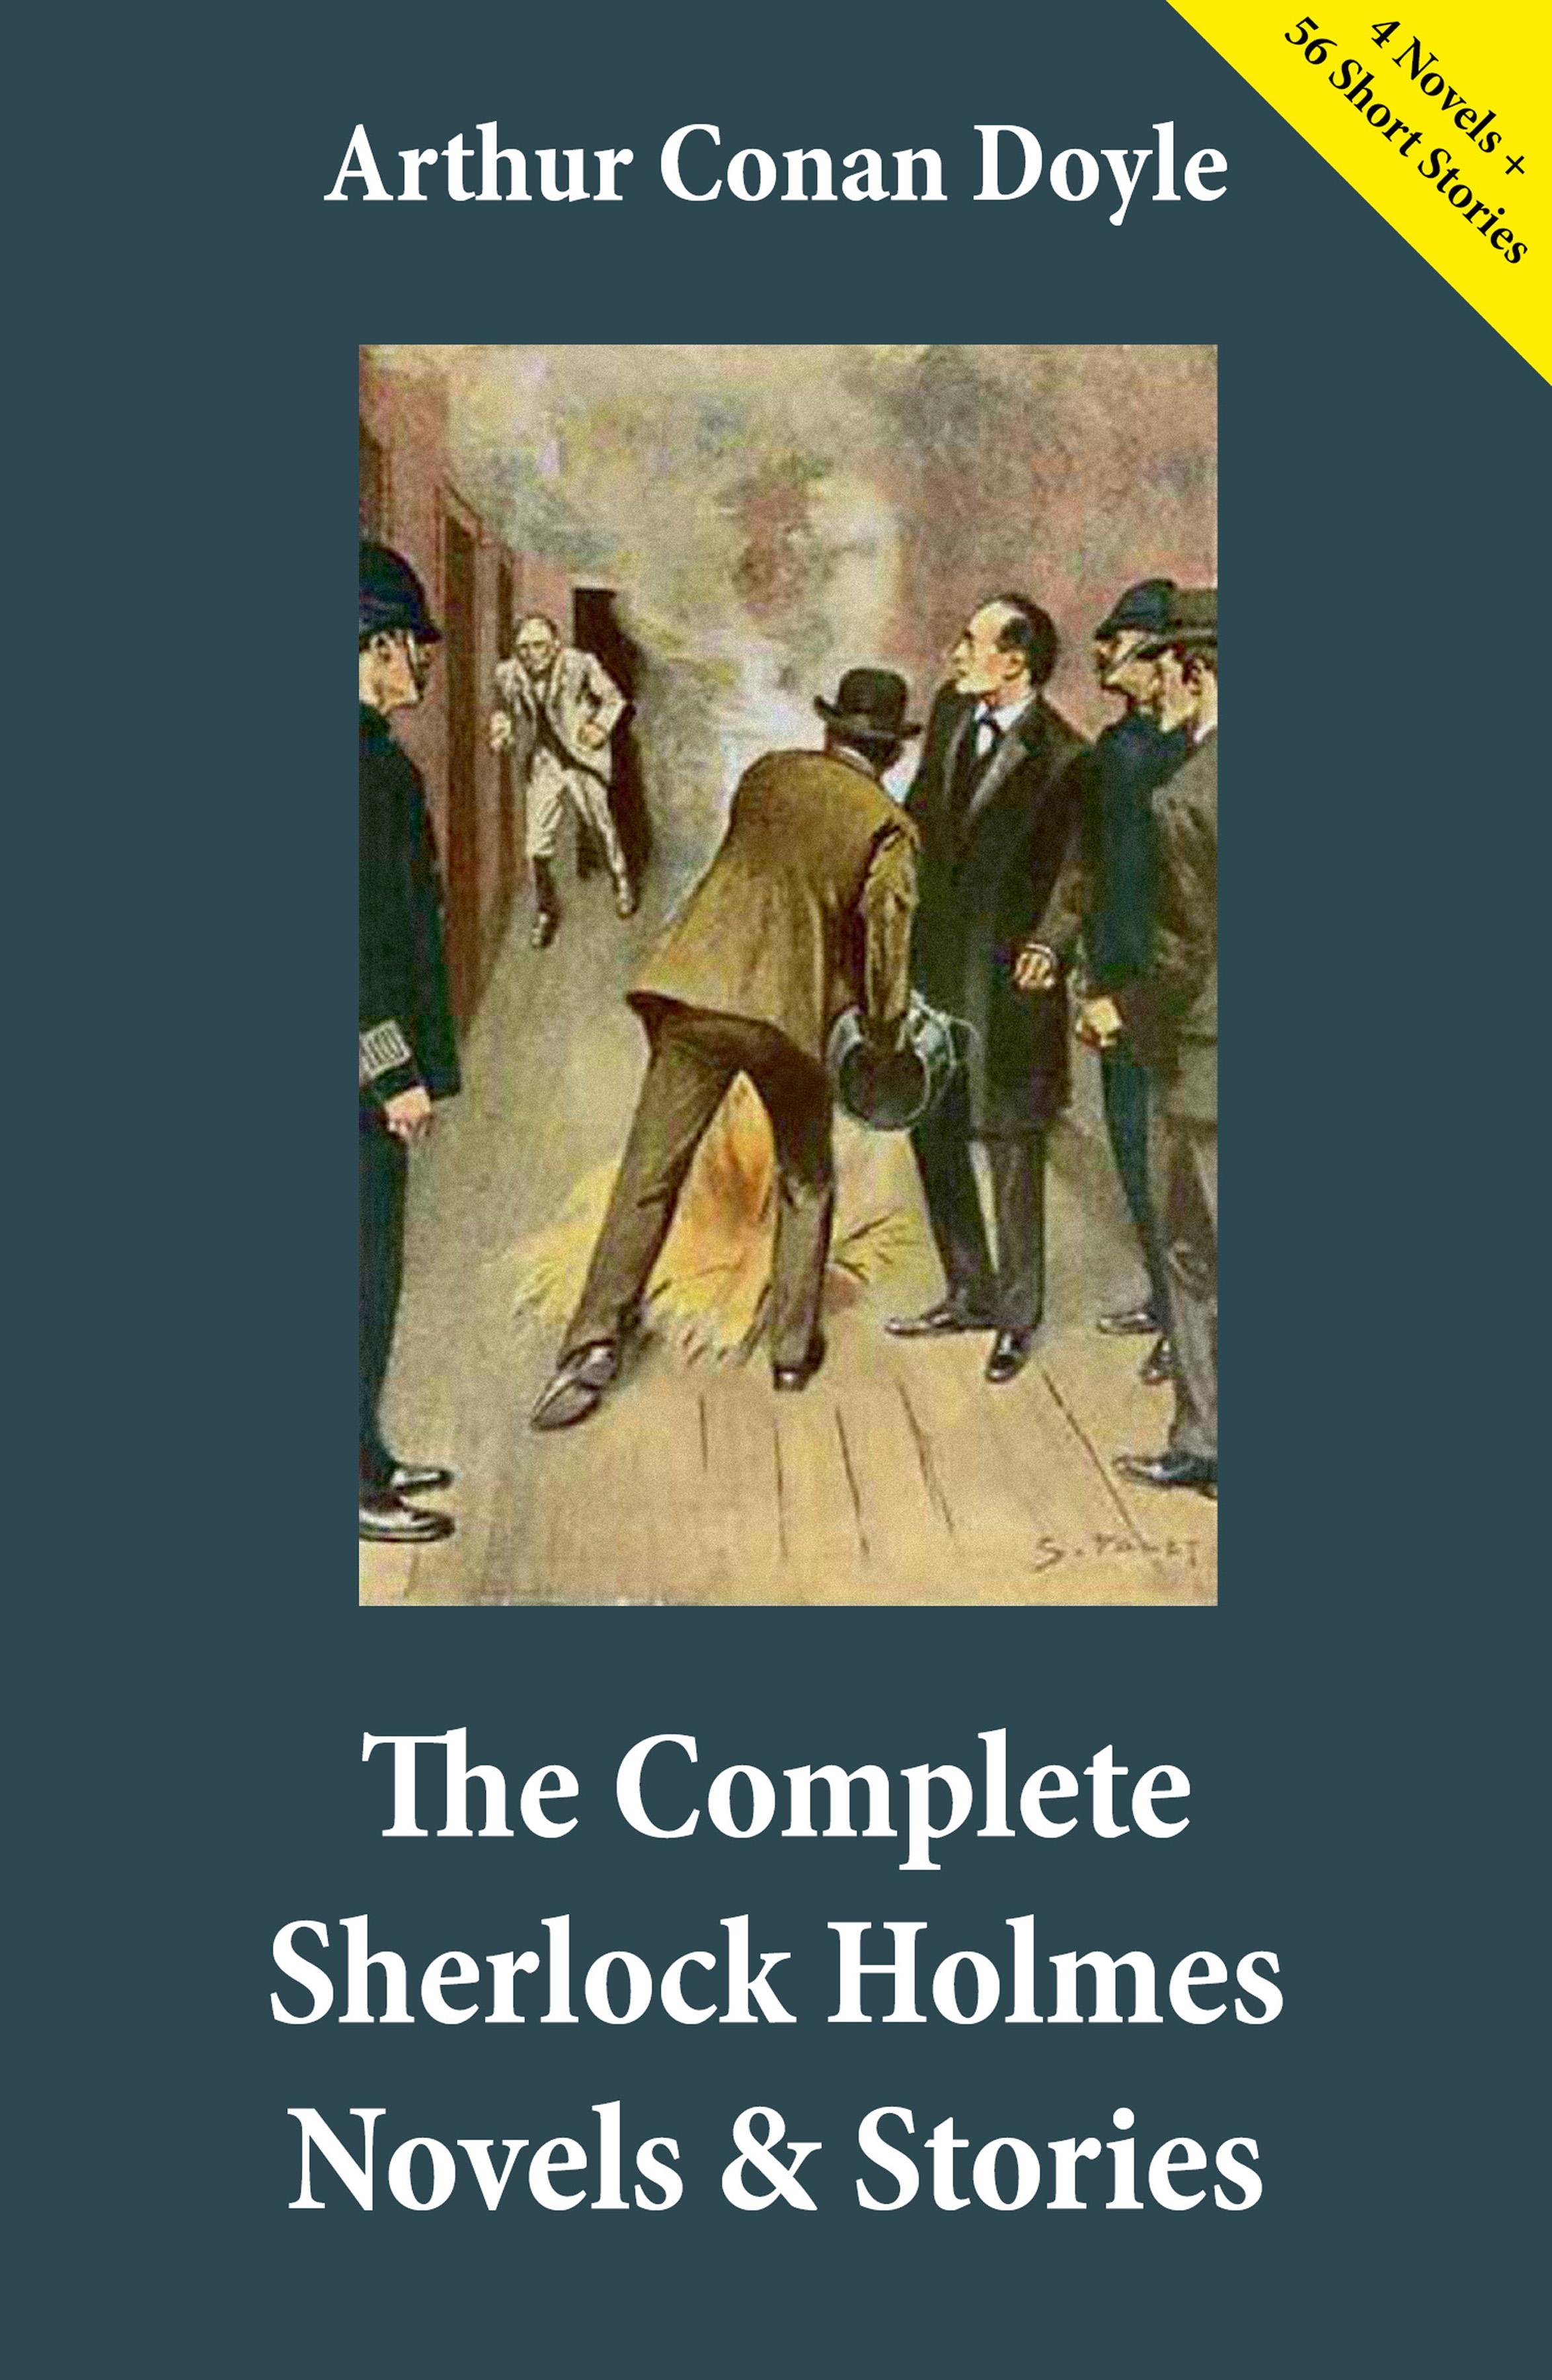 Arthur Conan Doyle The Complete Sherlock Holmes Novels & Stories (4 Novels + 56 Short Stories) doyle a c collected short stories ii the death voyage коллекция рассказов 2 смертельное путешествие на ан